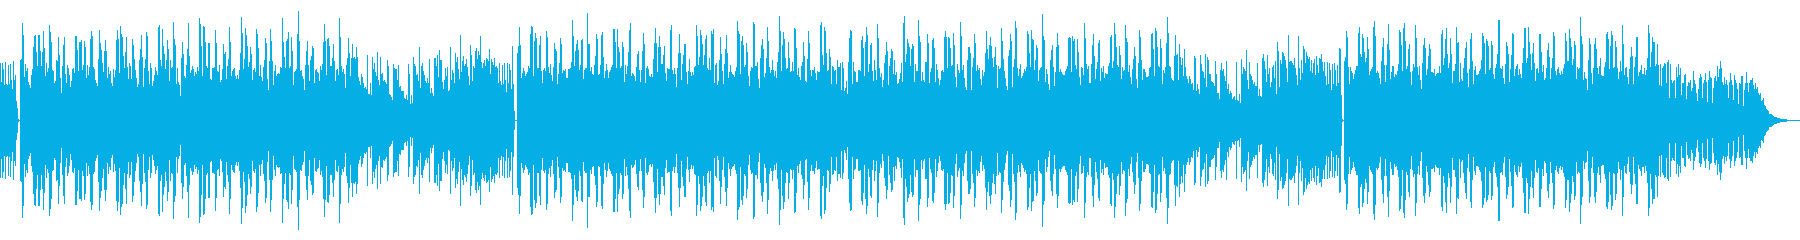 Urban / fashionable dubstep ending's reproduced waveform